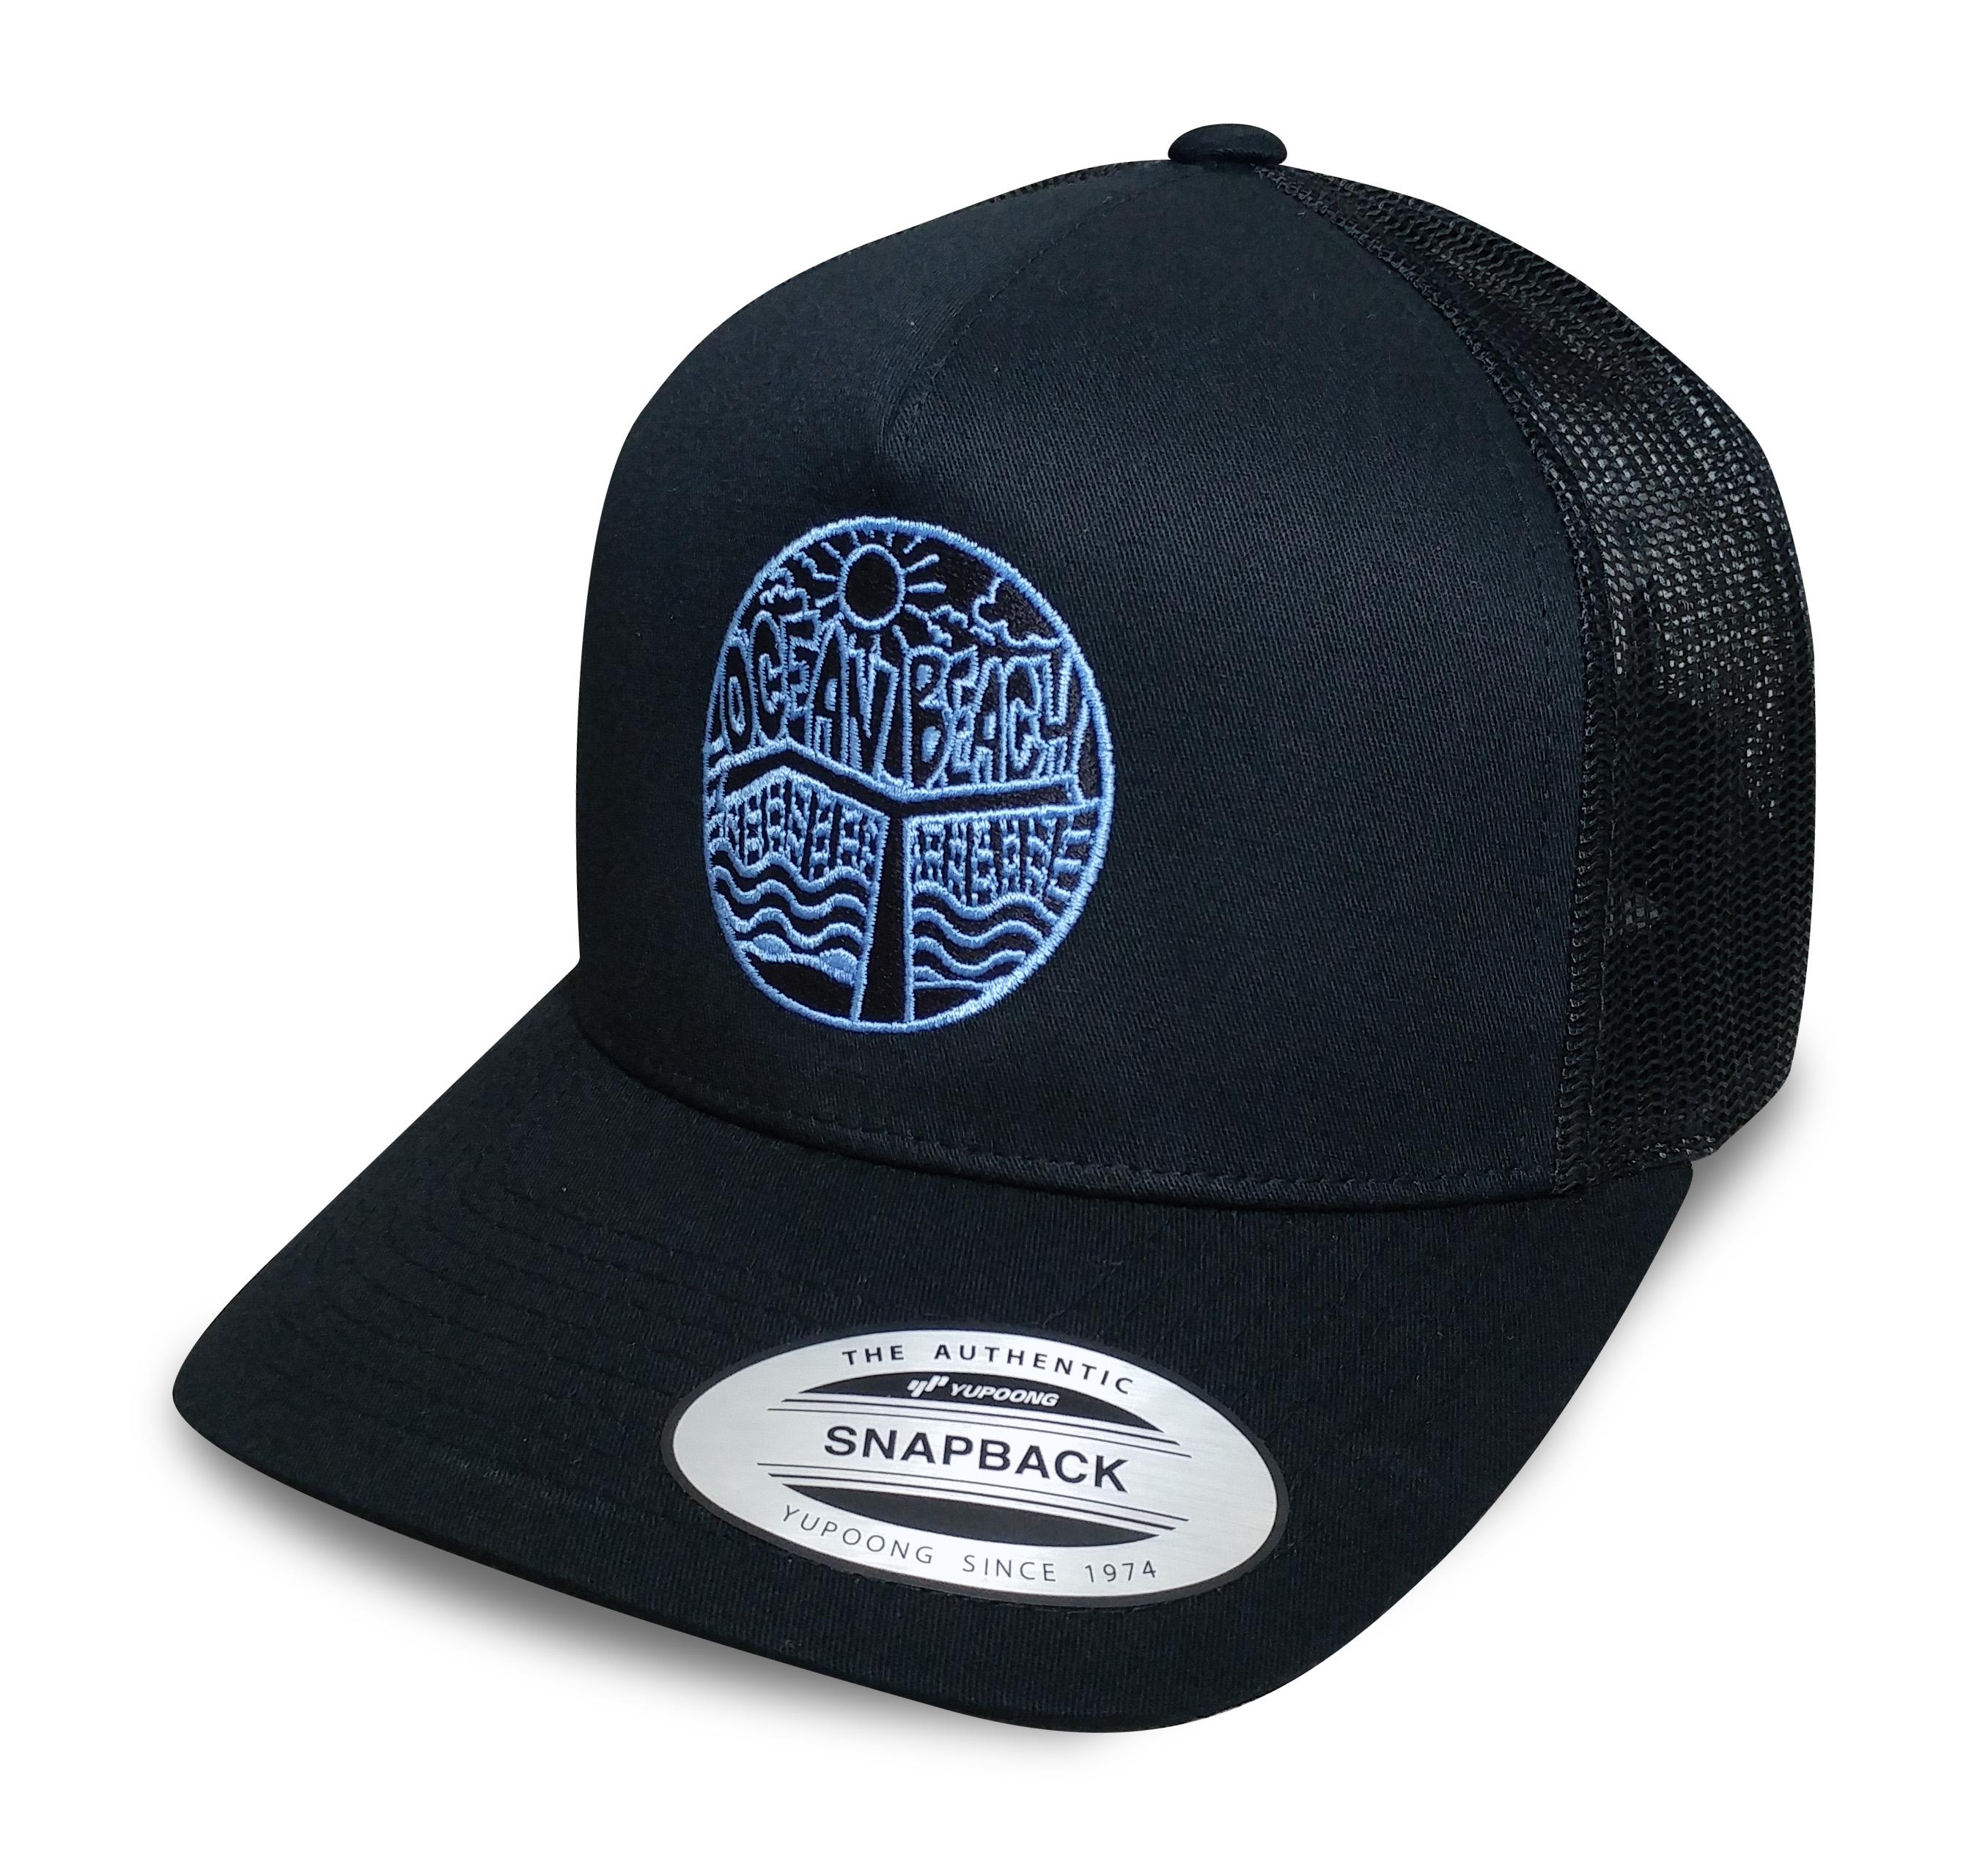 Ocean Beach Product: OB Pier Snapback Hat (blue logo)